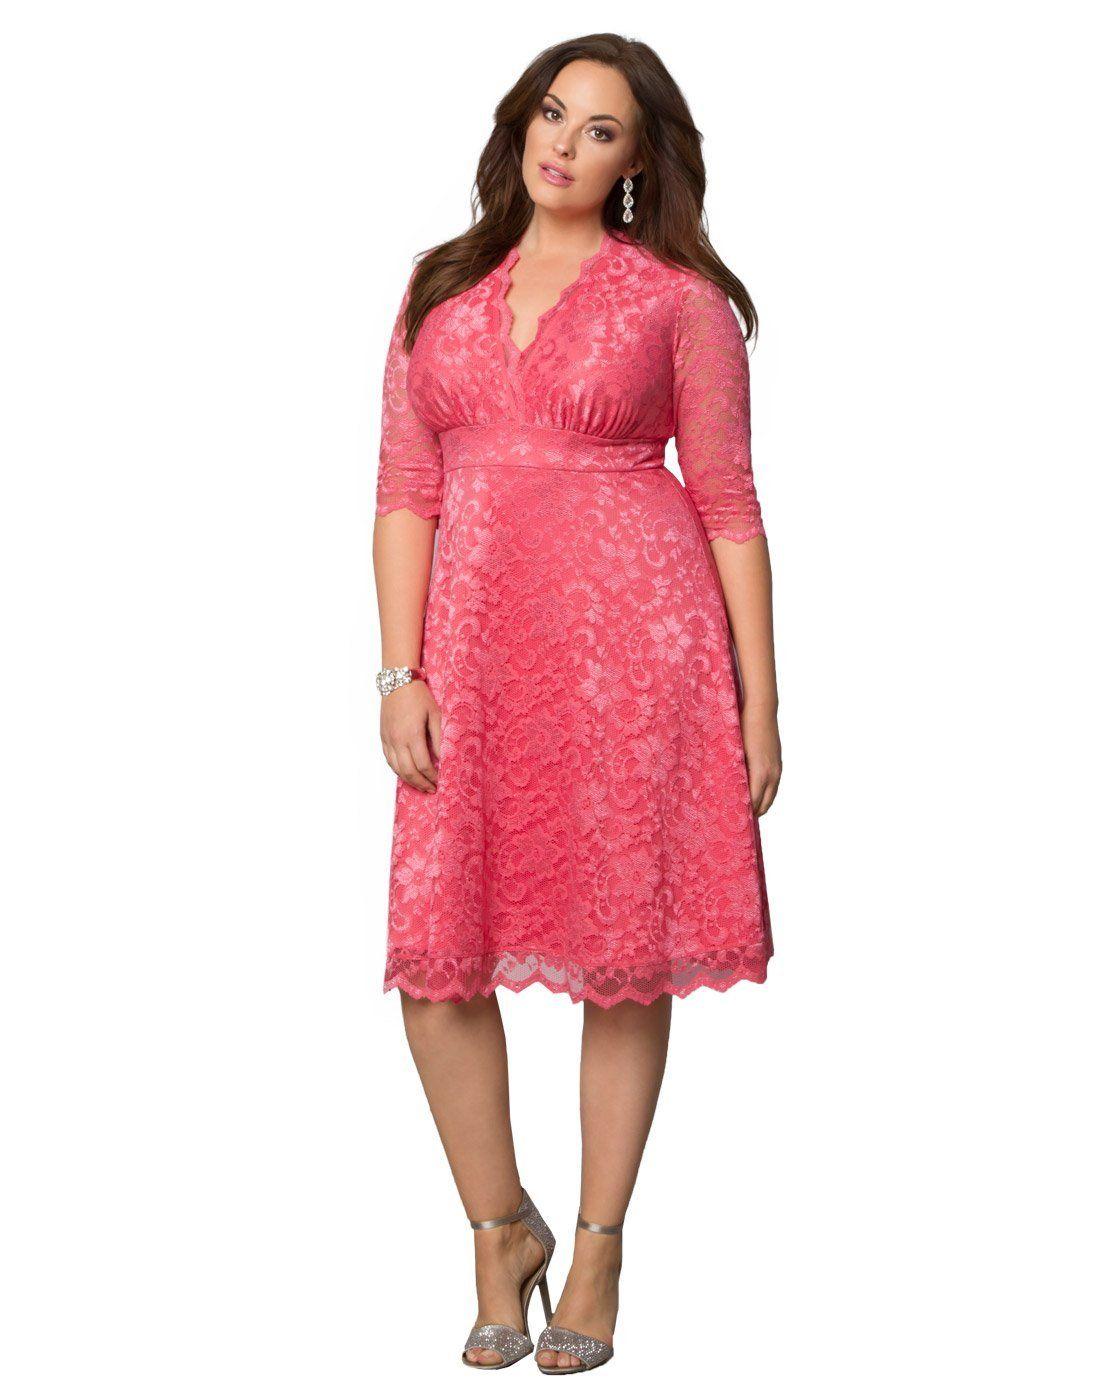 Kiyonna Womens Plus Size Mademoiselle Lace Dress 4x Onyx Amazon